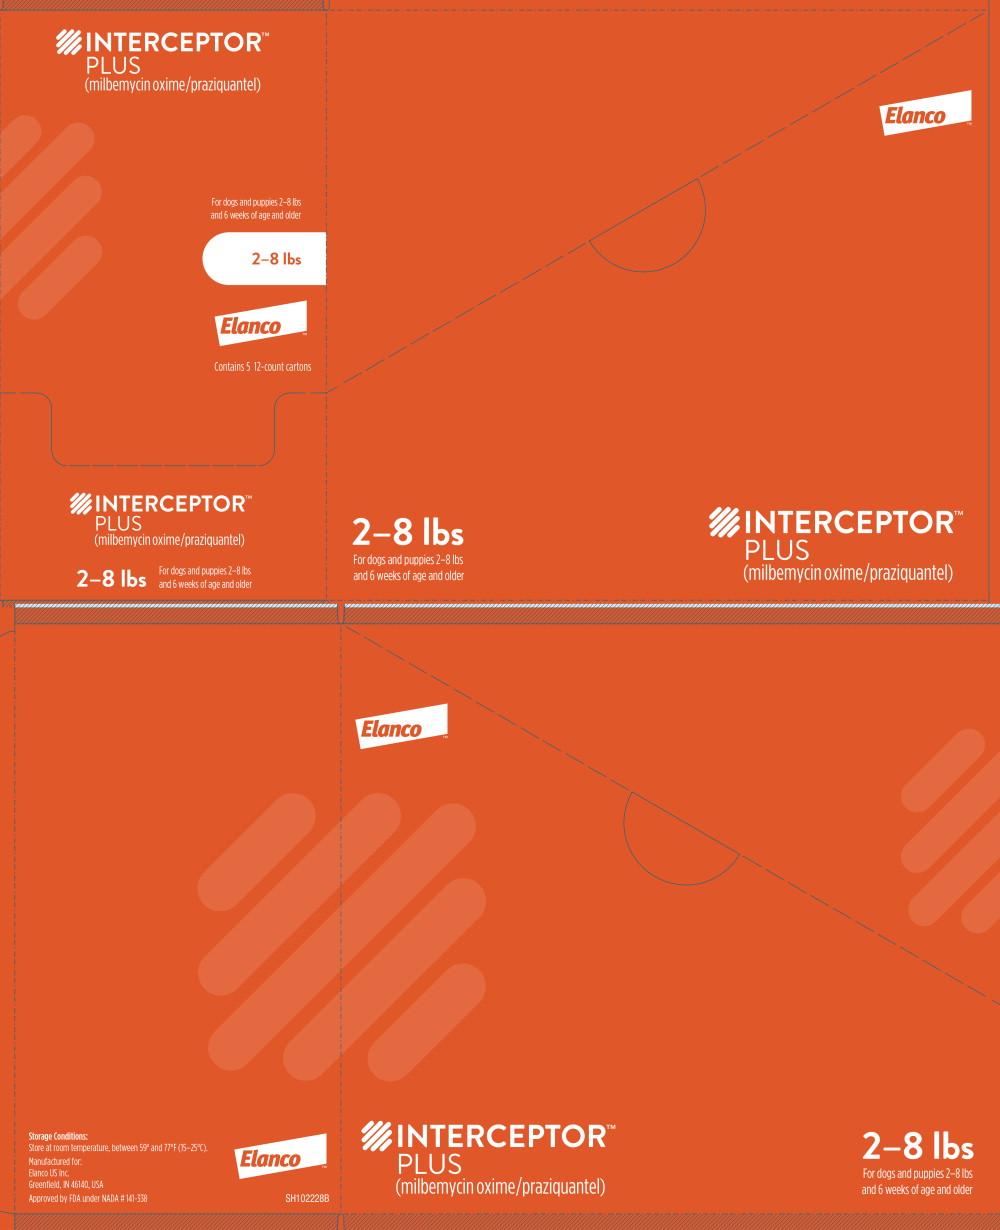 Principal Display Panel - Interceptor Plus 2-8 lbs 12 Carton Box Label